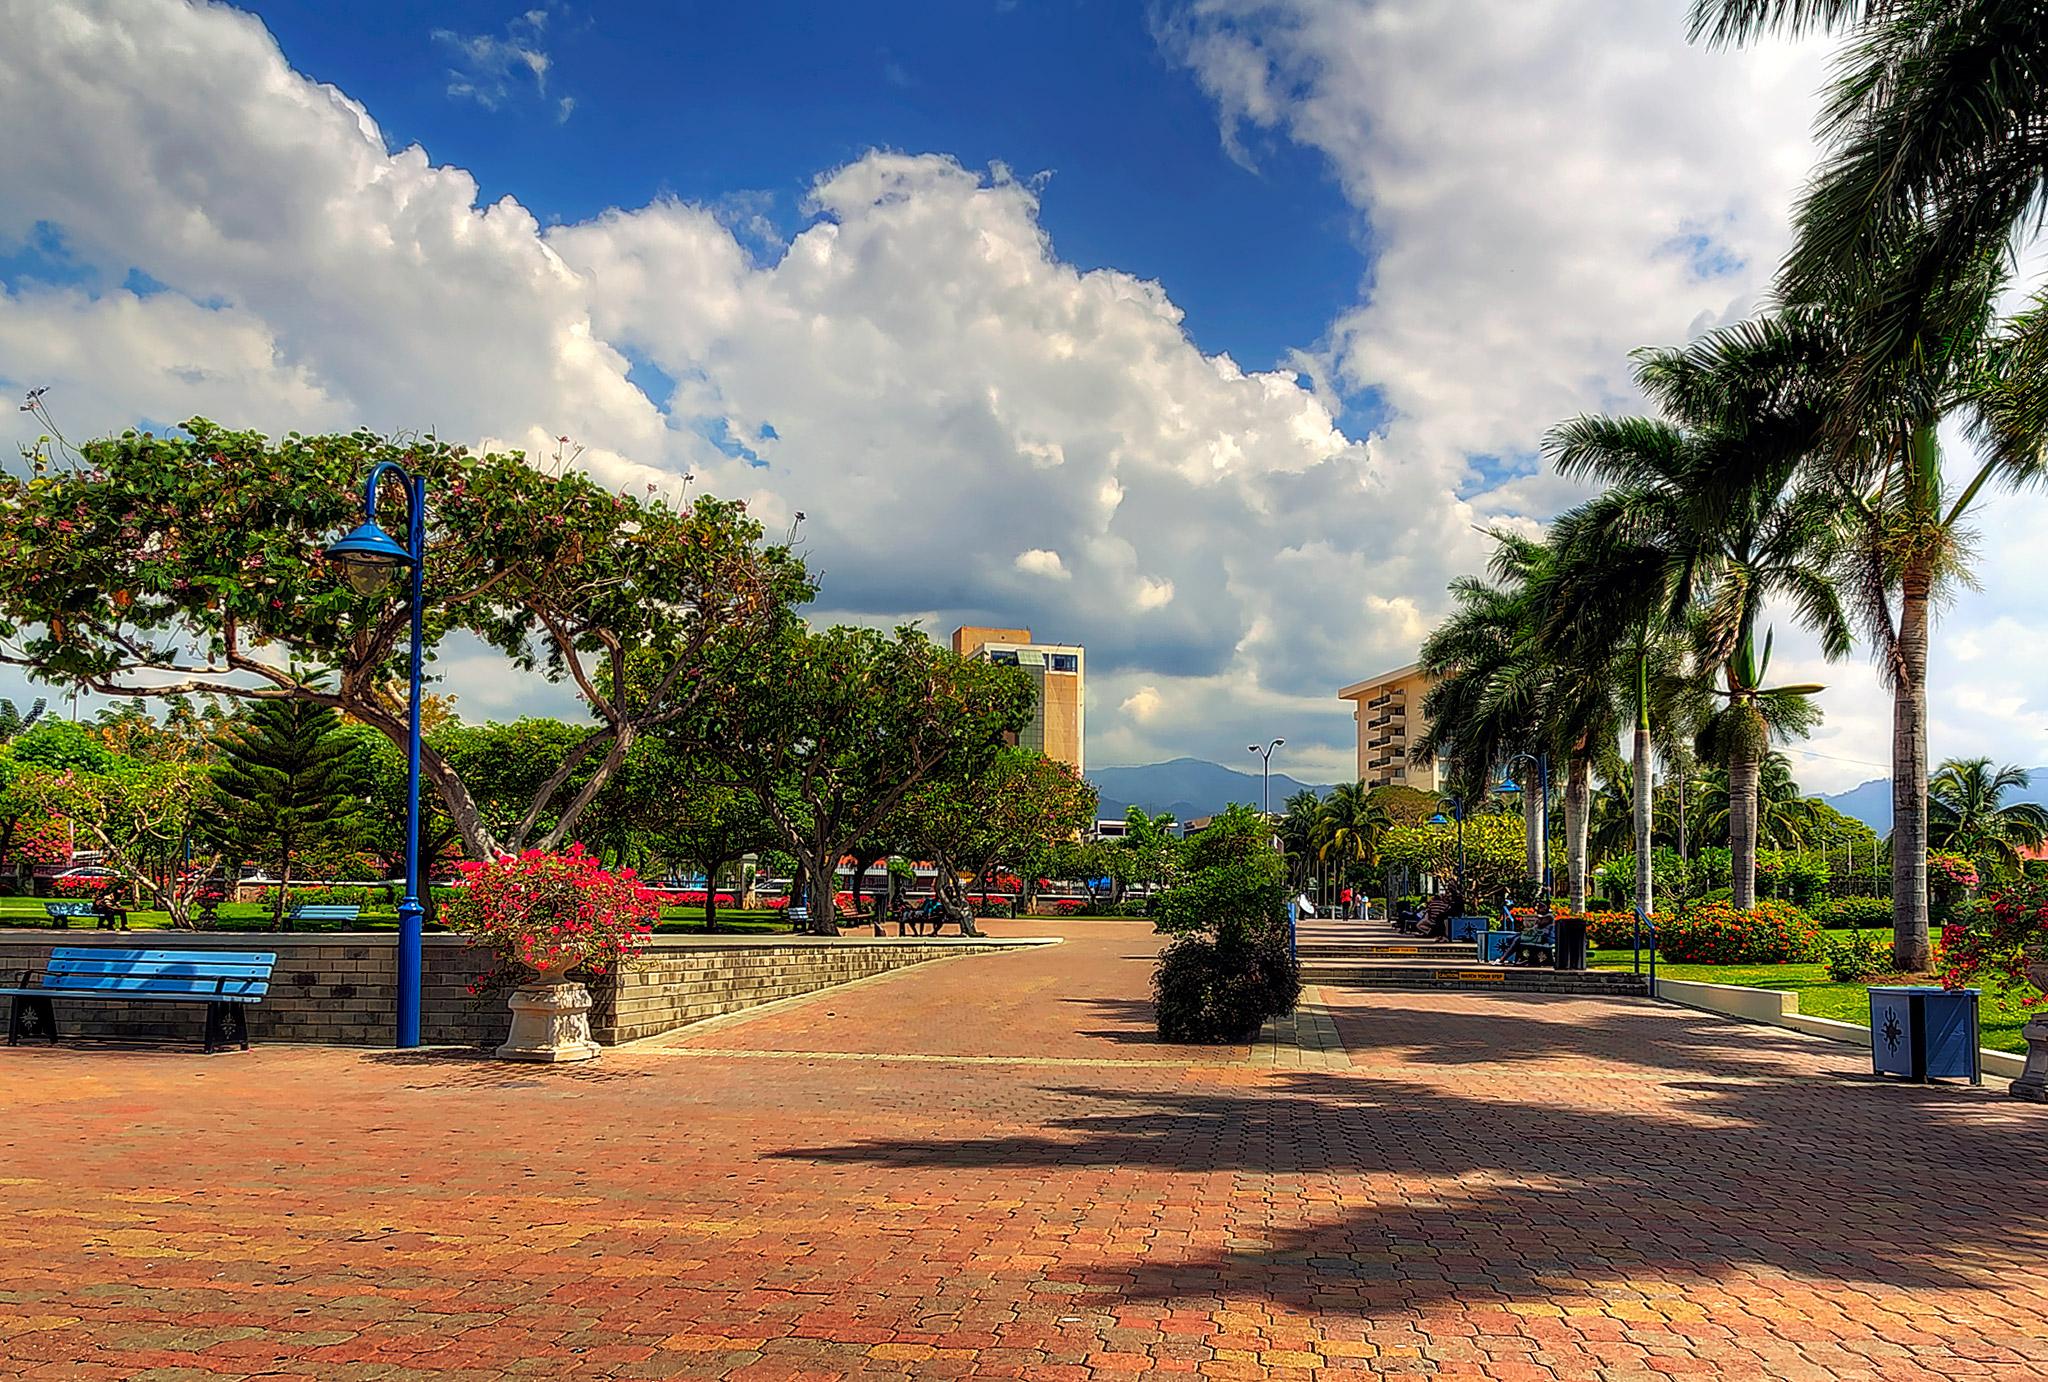 Emancipation Park in Kingston, Jamaica.